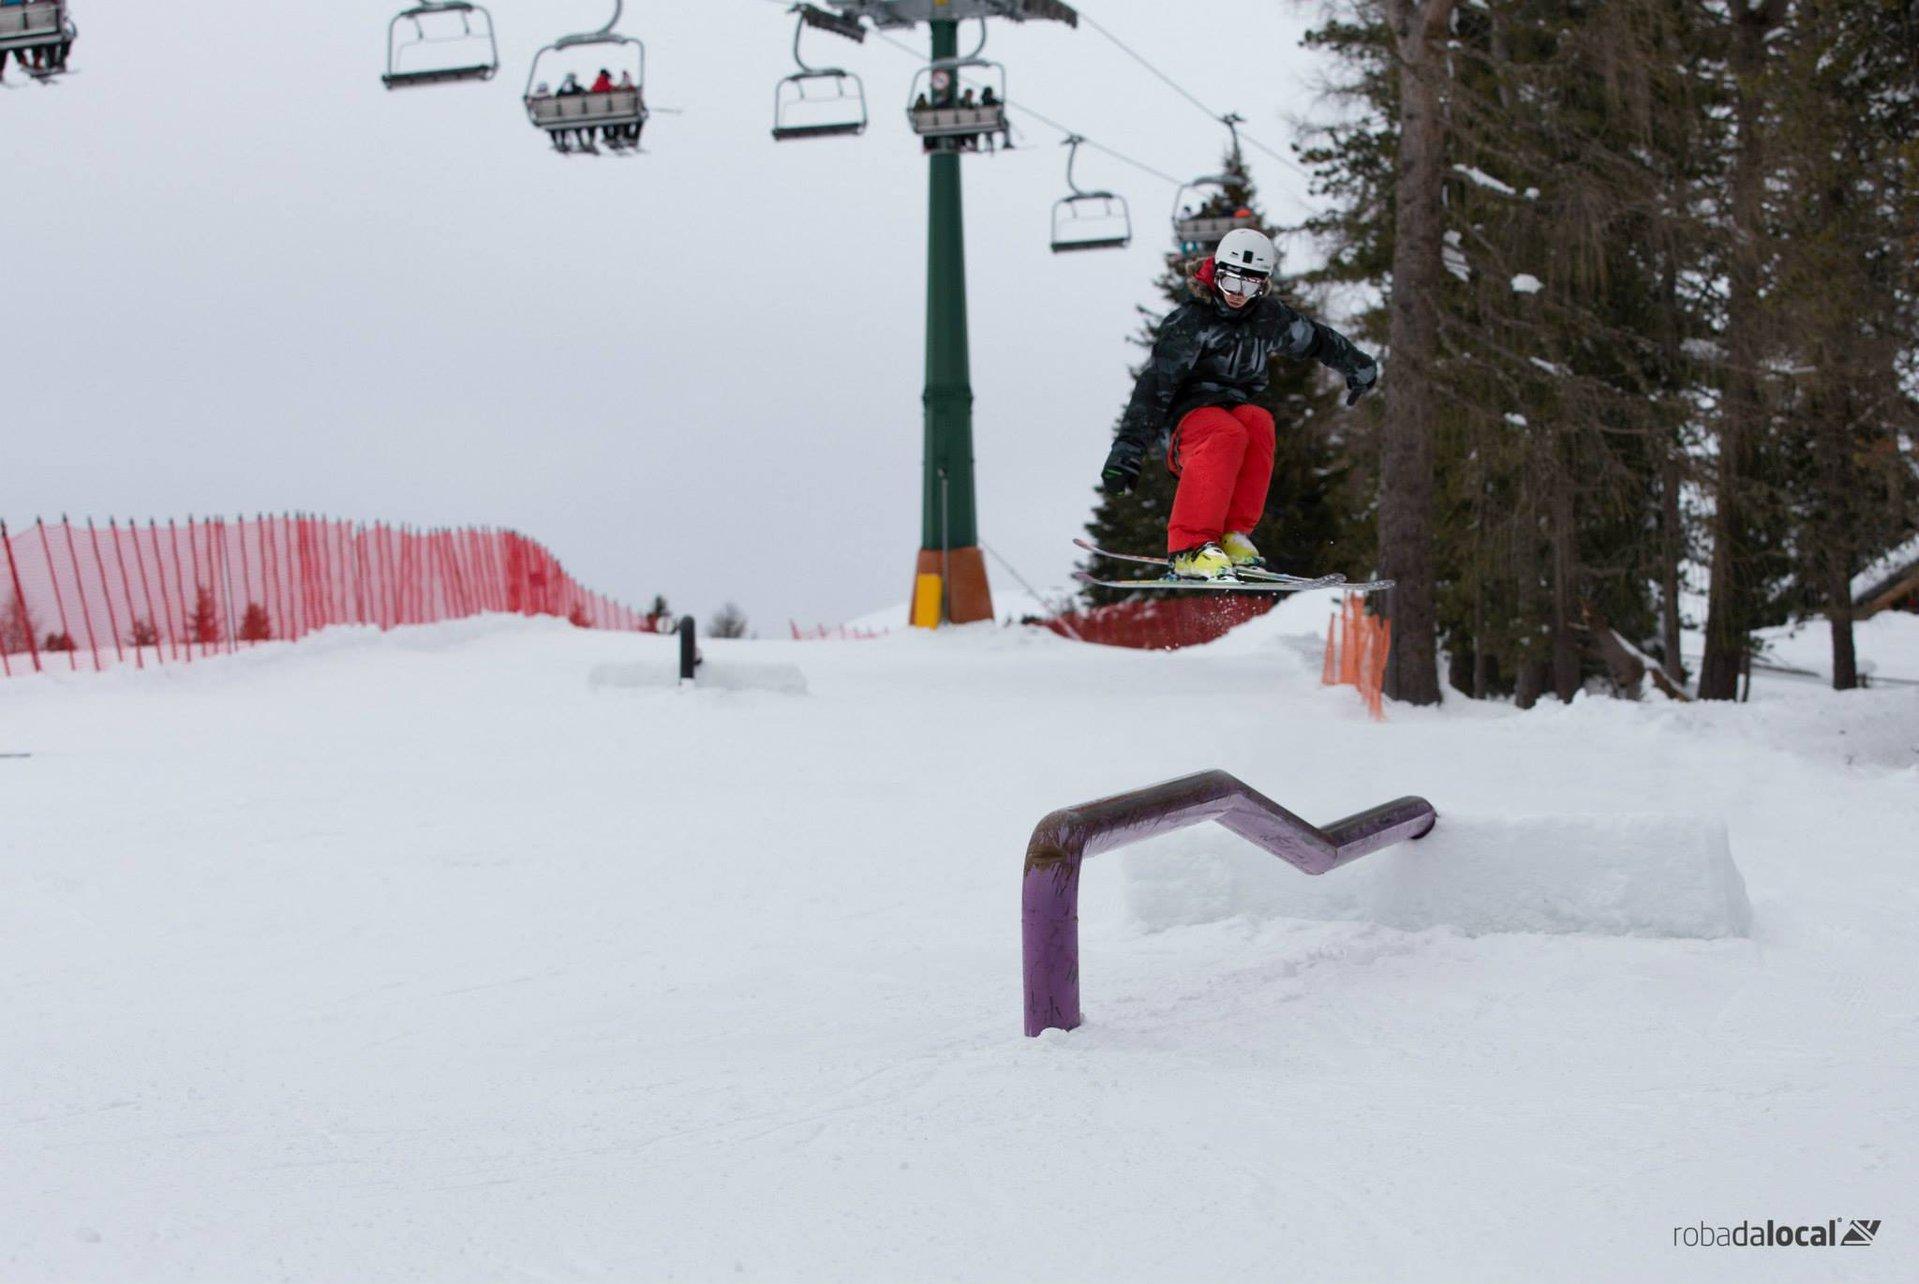 Disaster @ Morea Snowpark